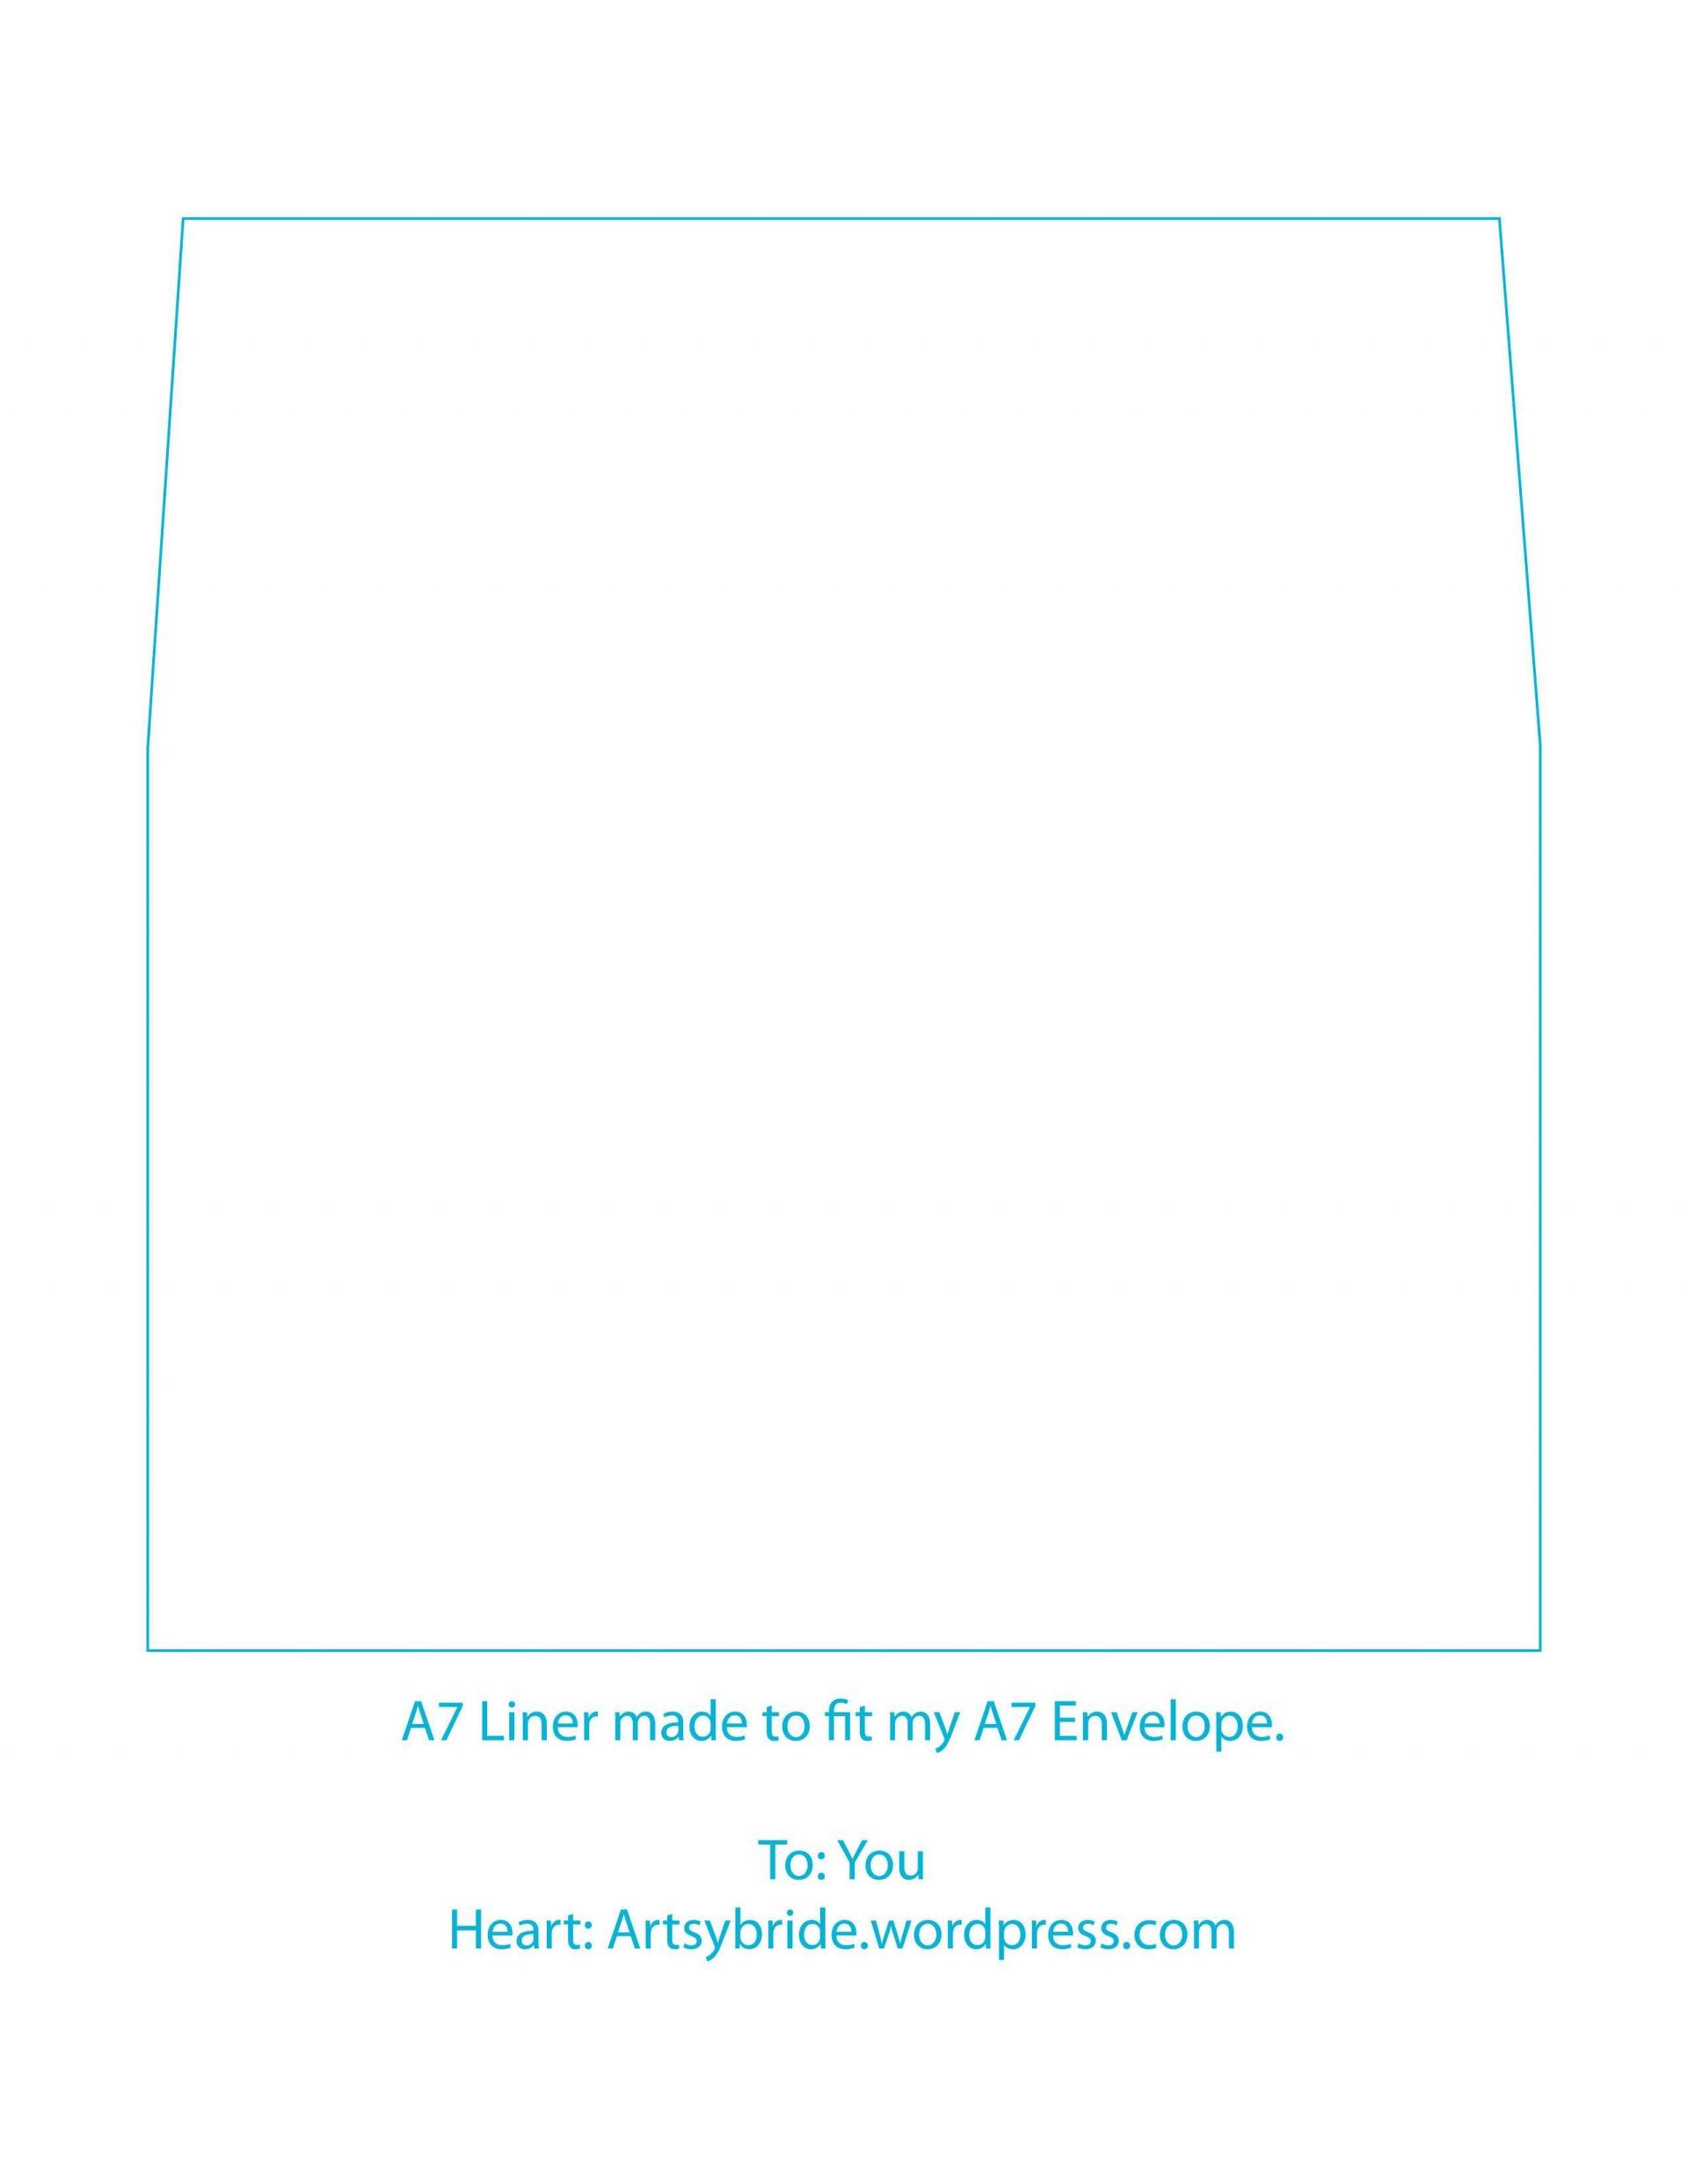 003 Sensational A7 Square Flap Envelope Liner Template Inspiration 1920